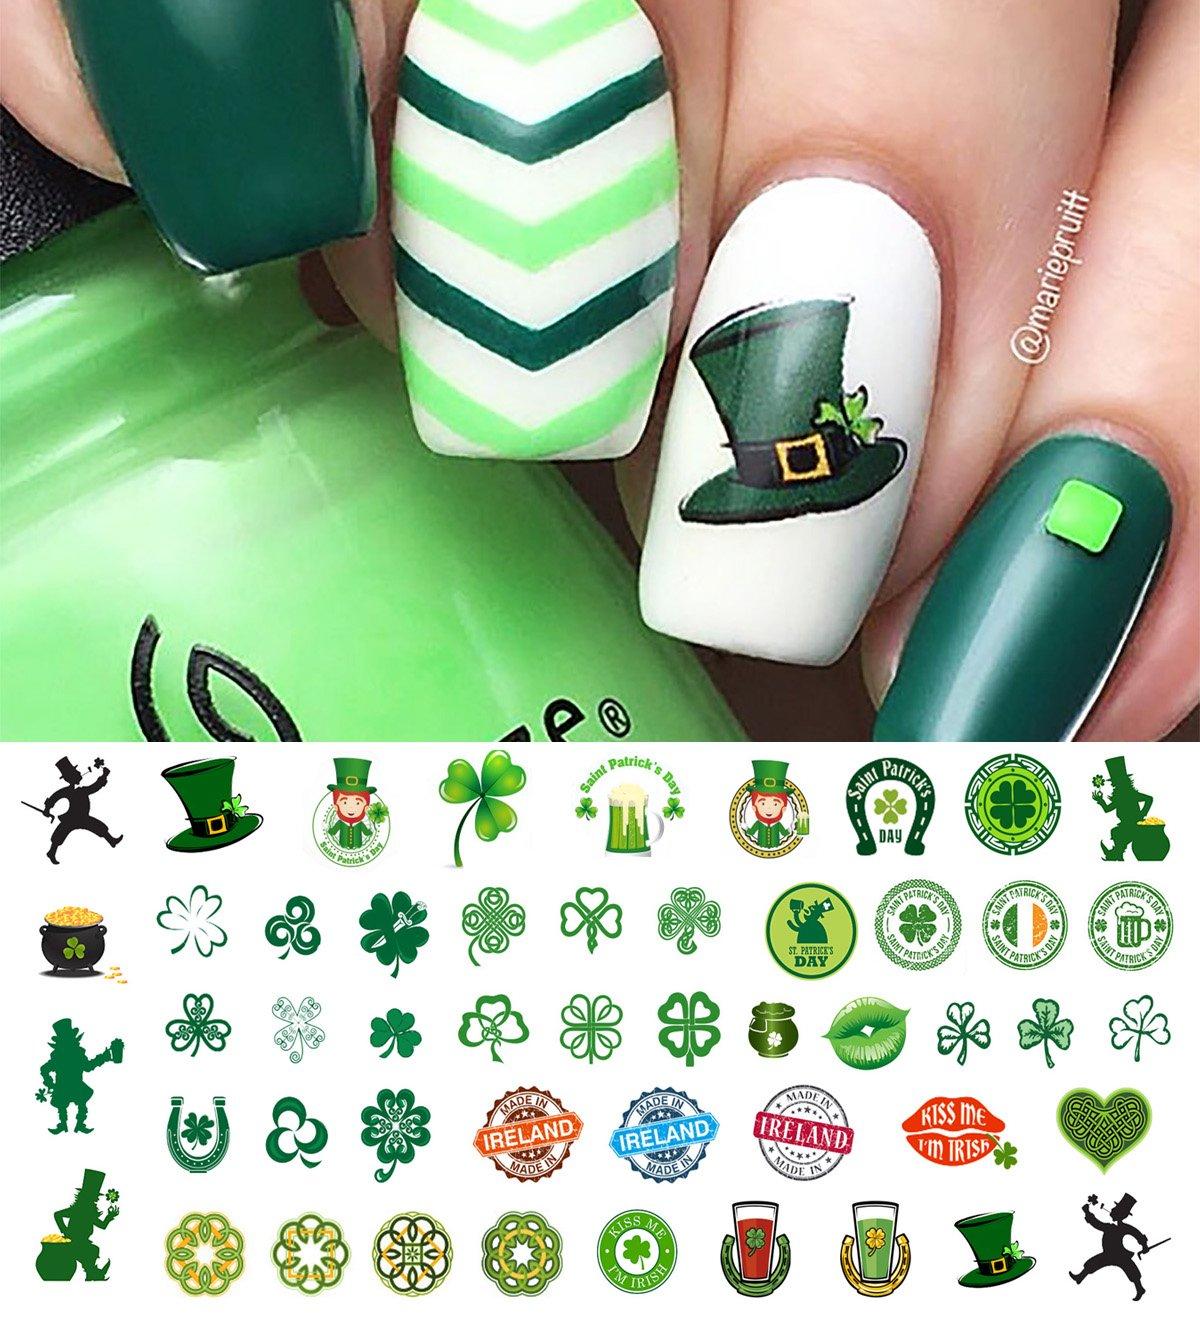 St. Patricks Day Luck of The Irish Set #2 Water Slide Nail Art Decals - Salon Quality!